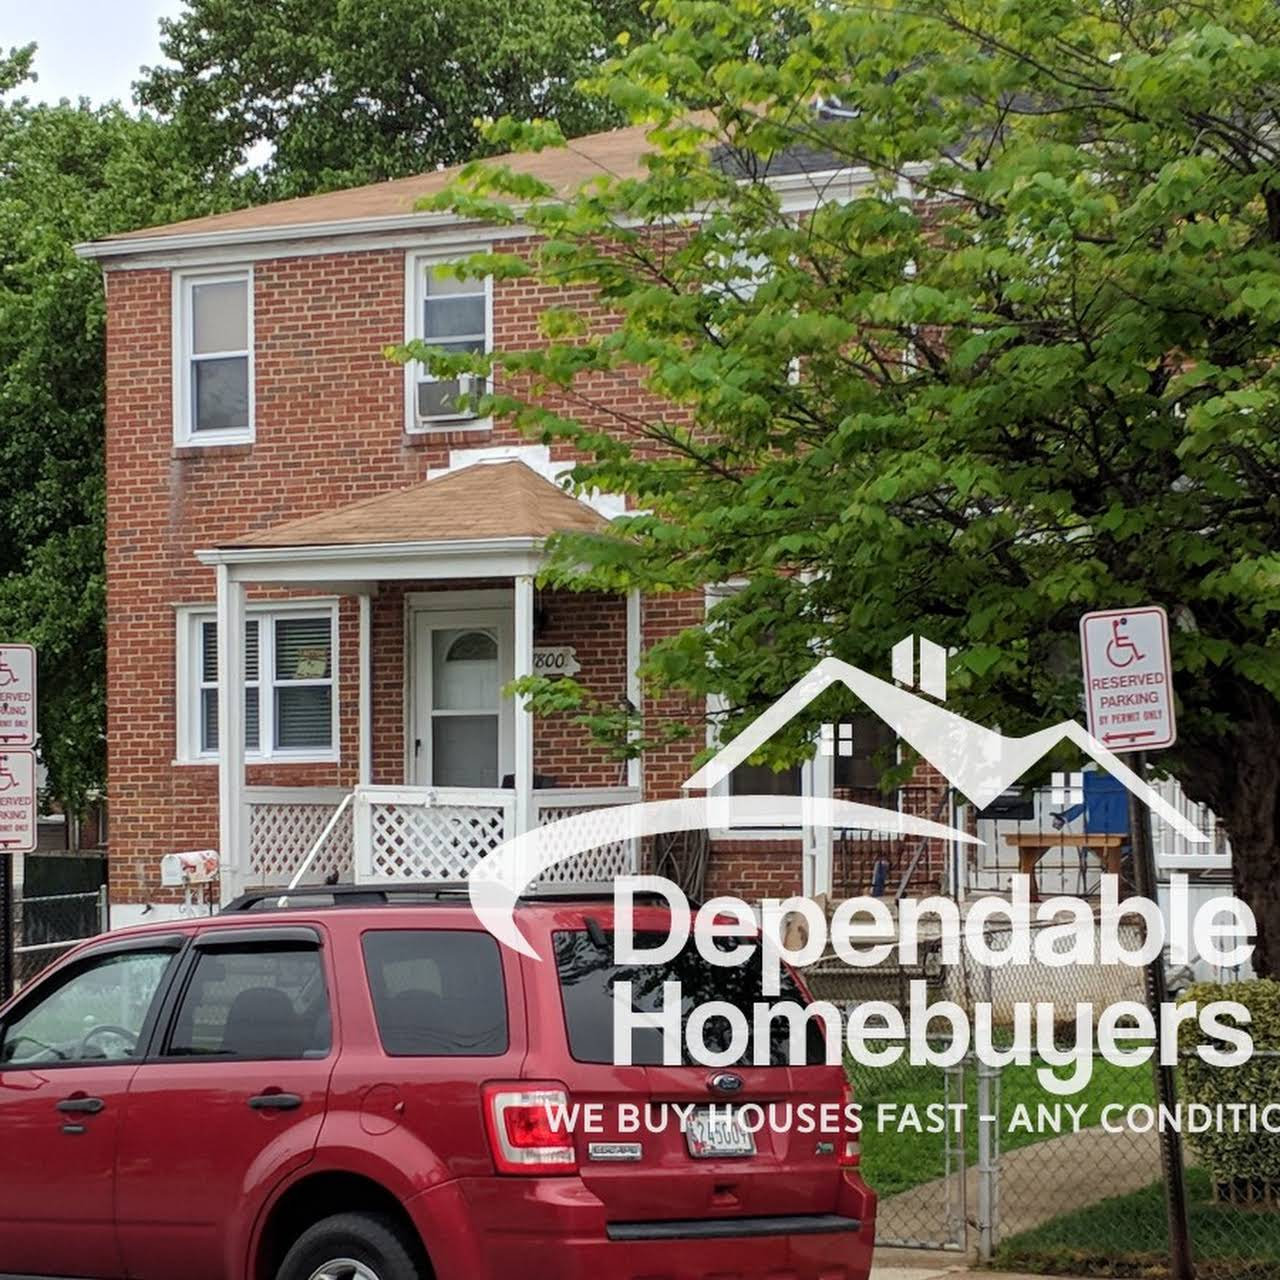 we buy houses near me Baltimore